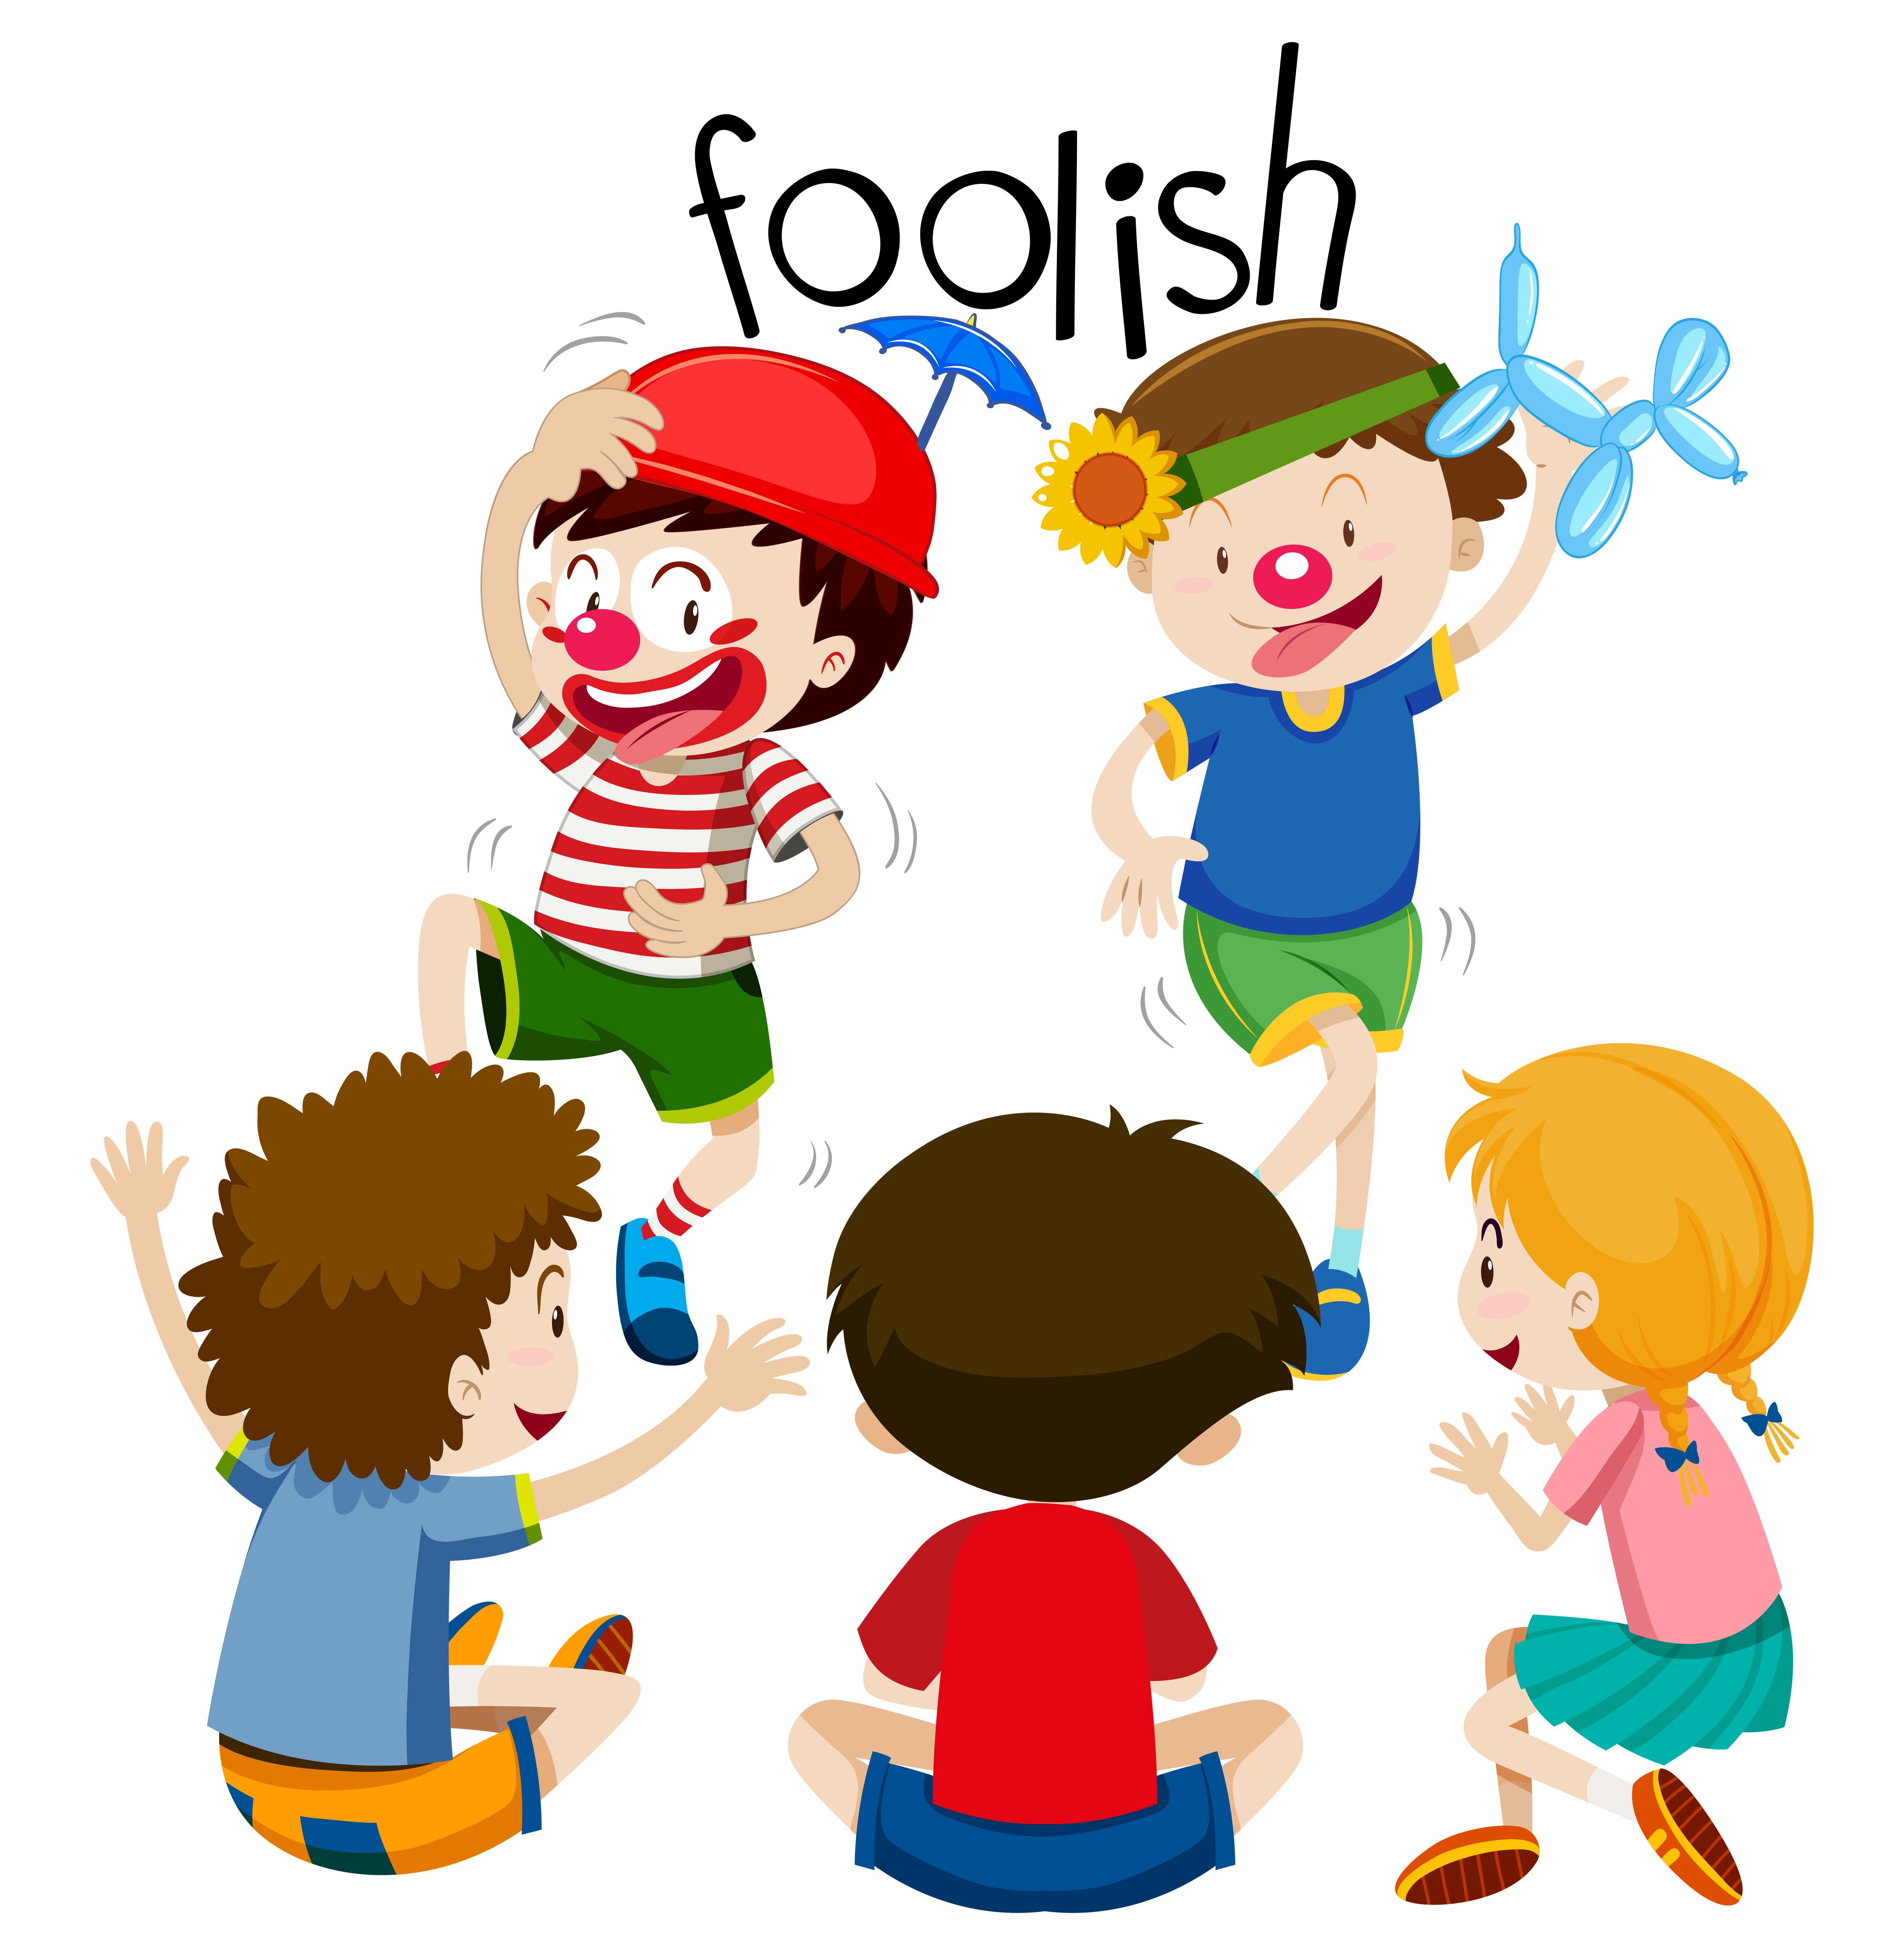 funny children being foolish - Download Free Vector Art ...